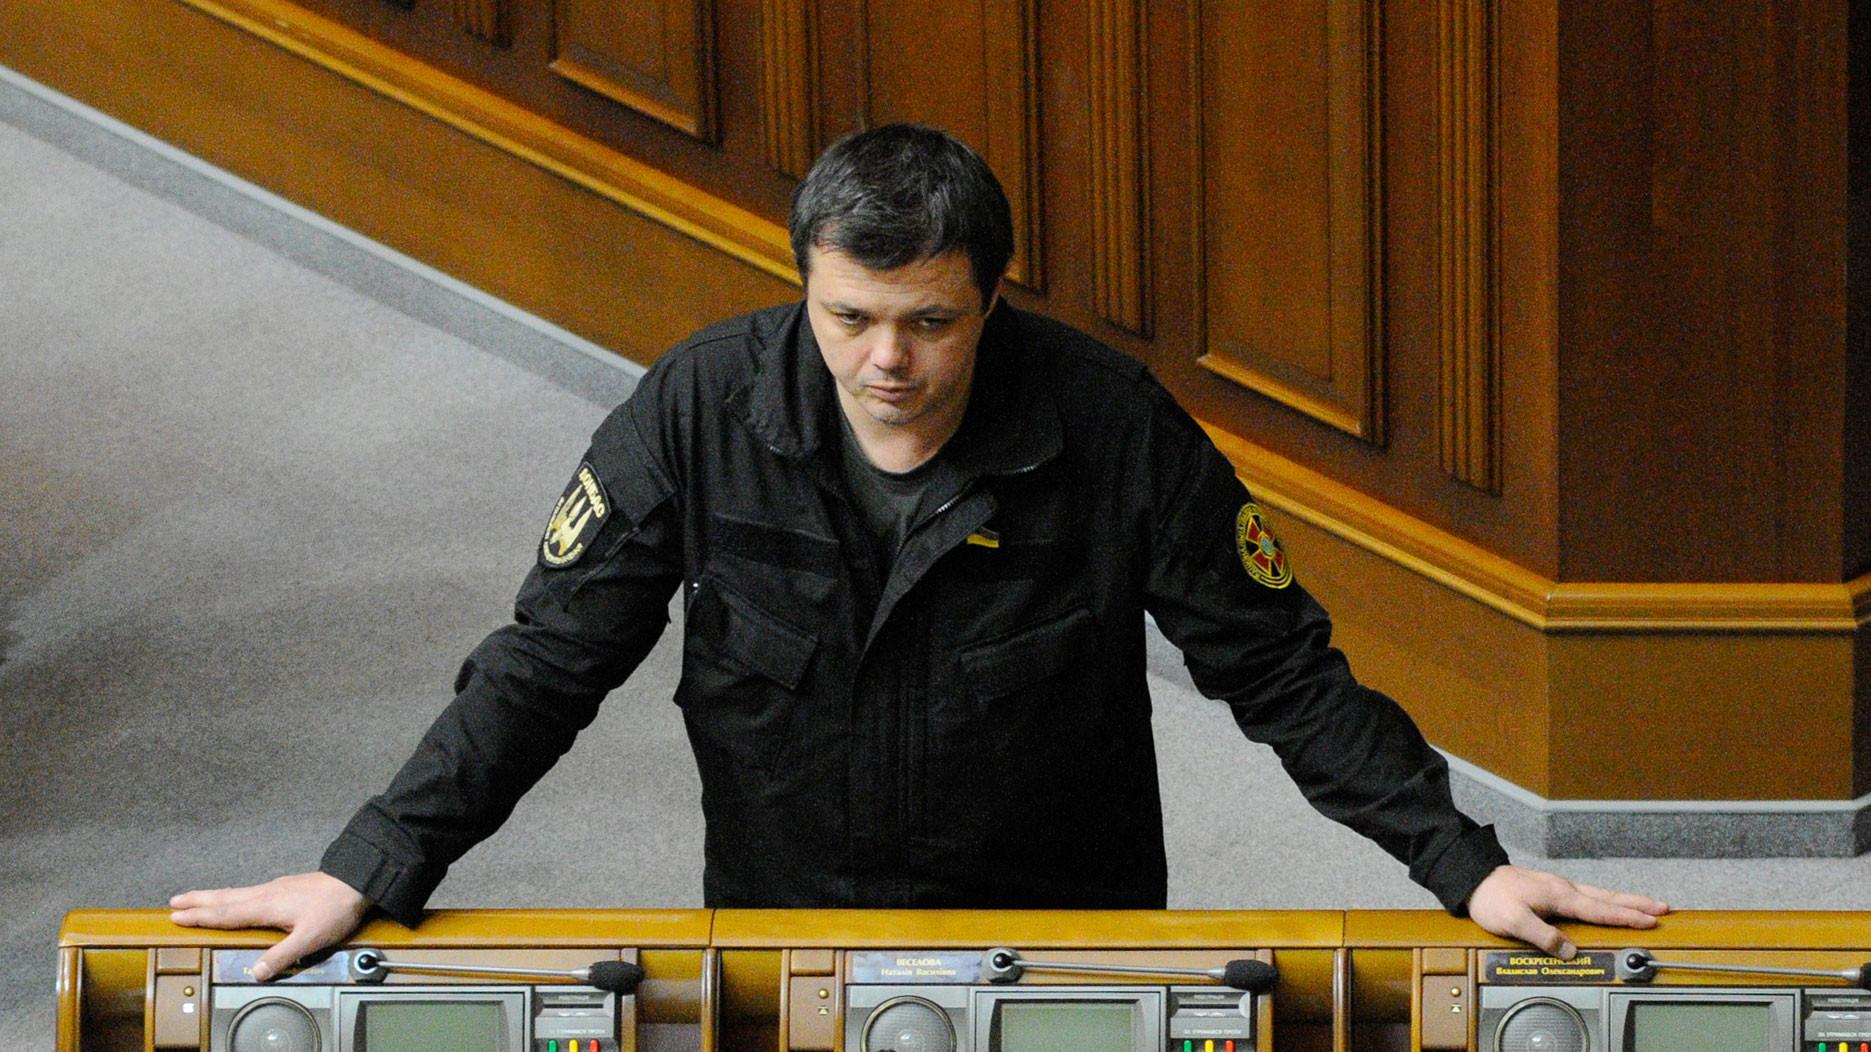 <p>Фото: &copy; РИА Новости /&nbsp;Александр Максименко</p>